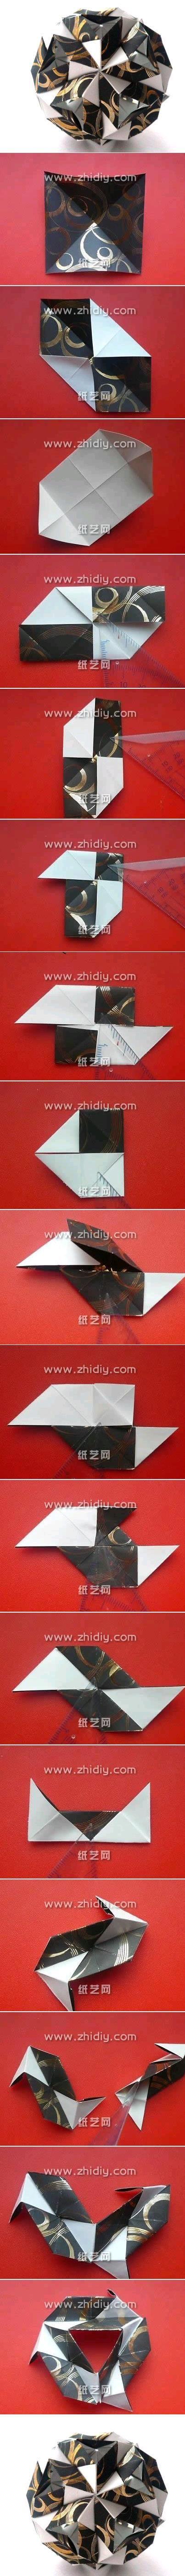 Kusudama Origami Lantern *made it*but mine didn't look like that...did i miss a step?